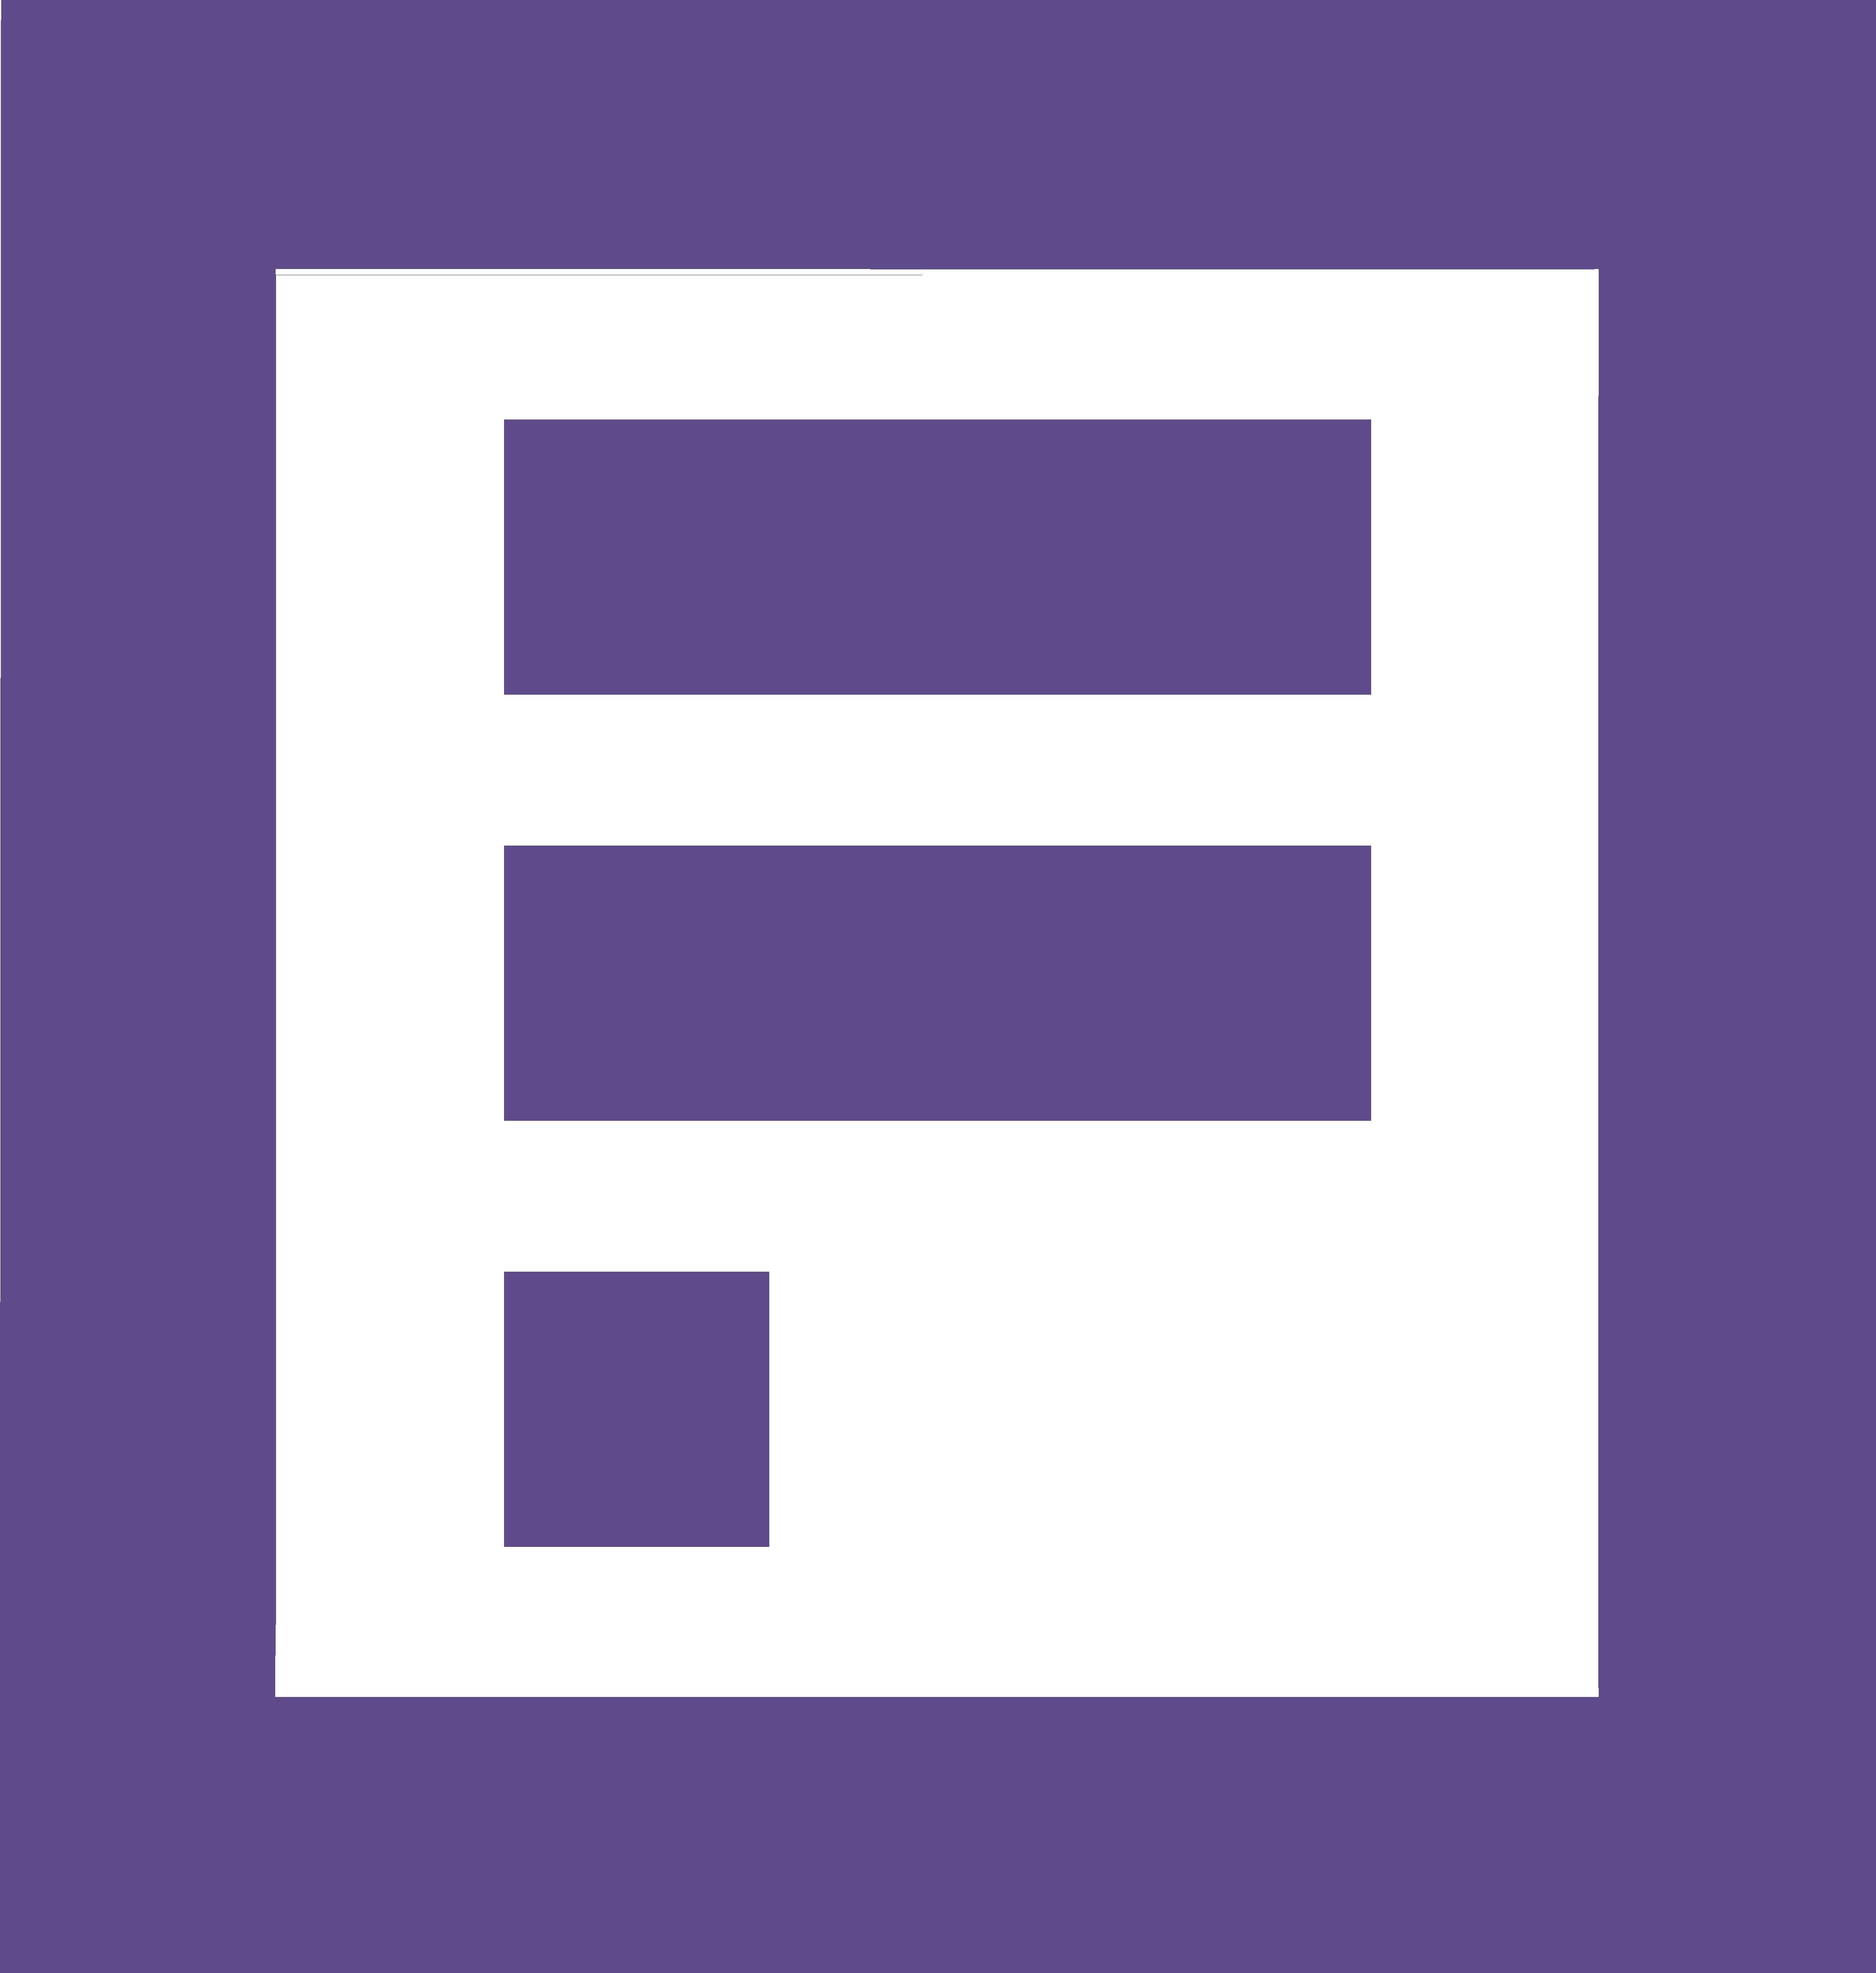 FairFrame Incorporated